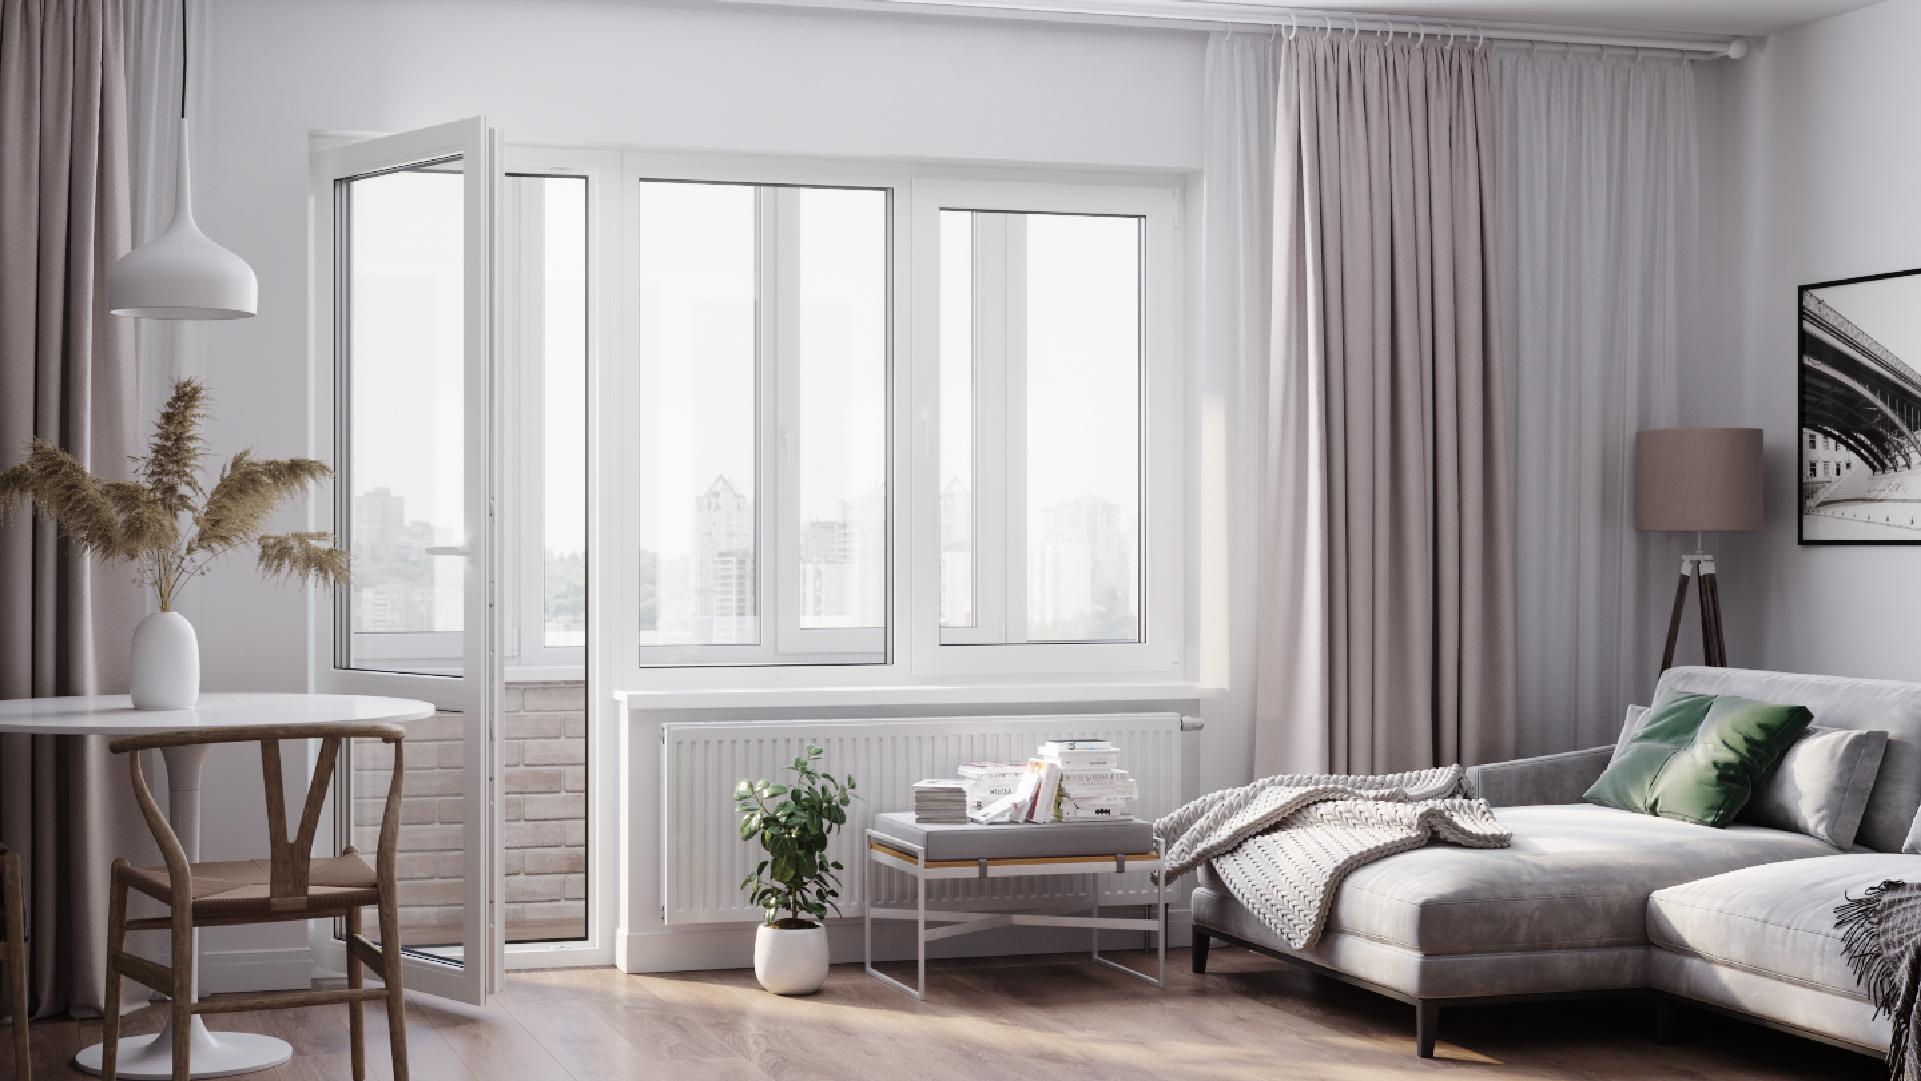 Окна для балкона - Фото 1